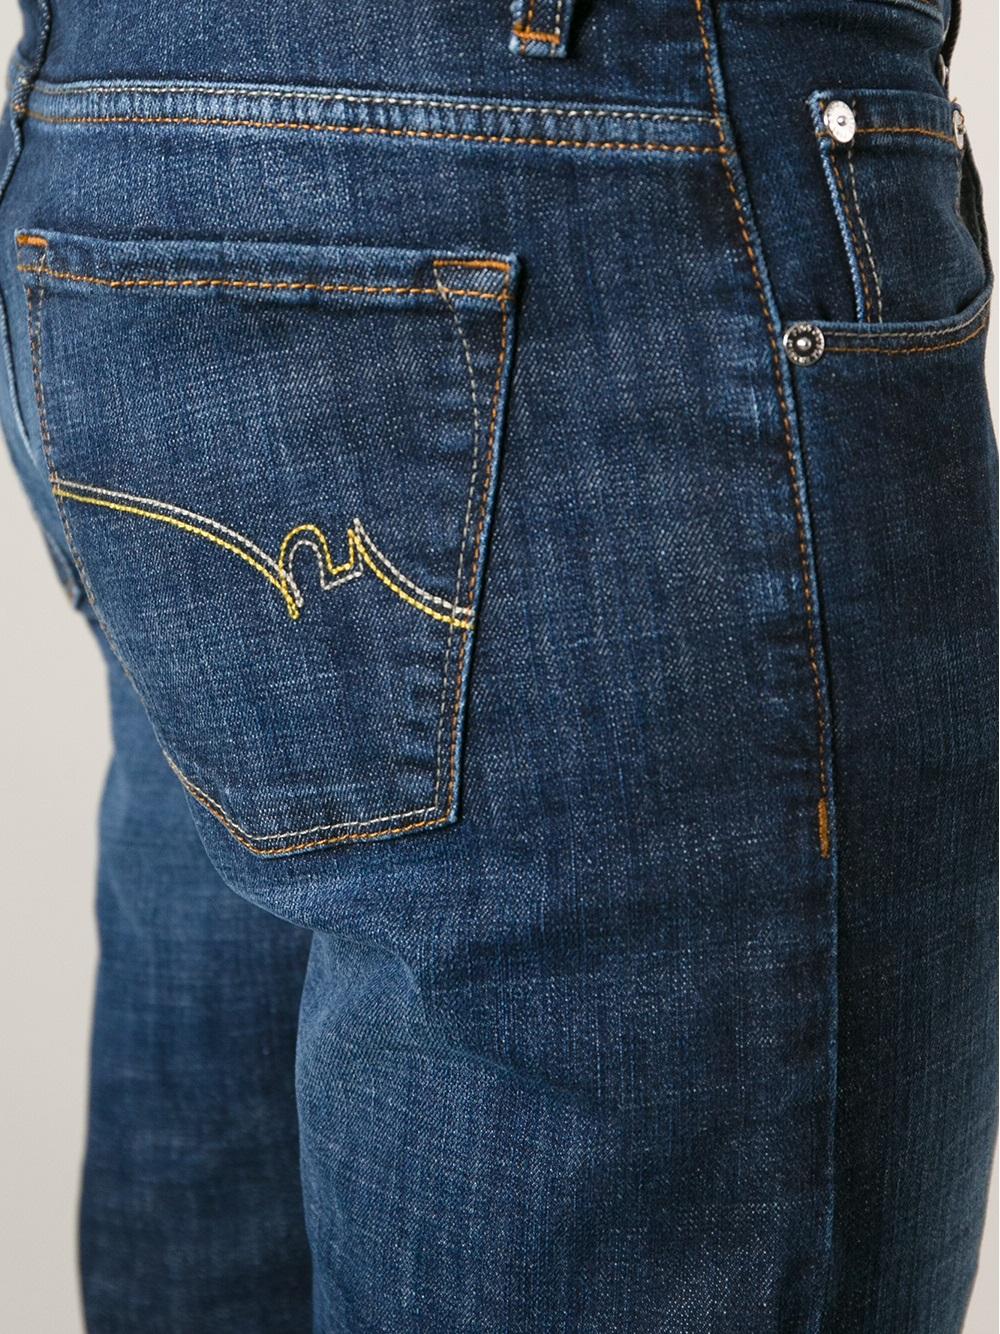 Jeans Slim Men